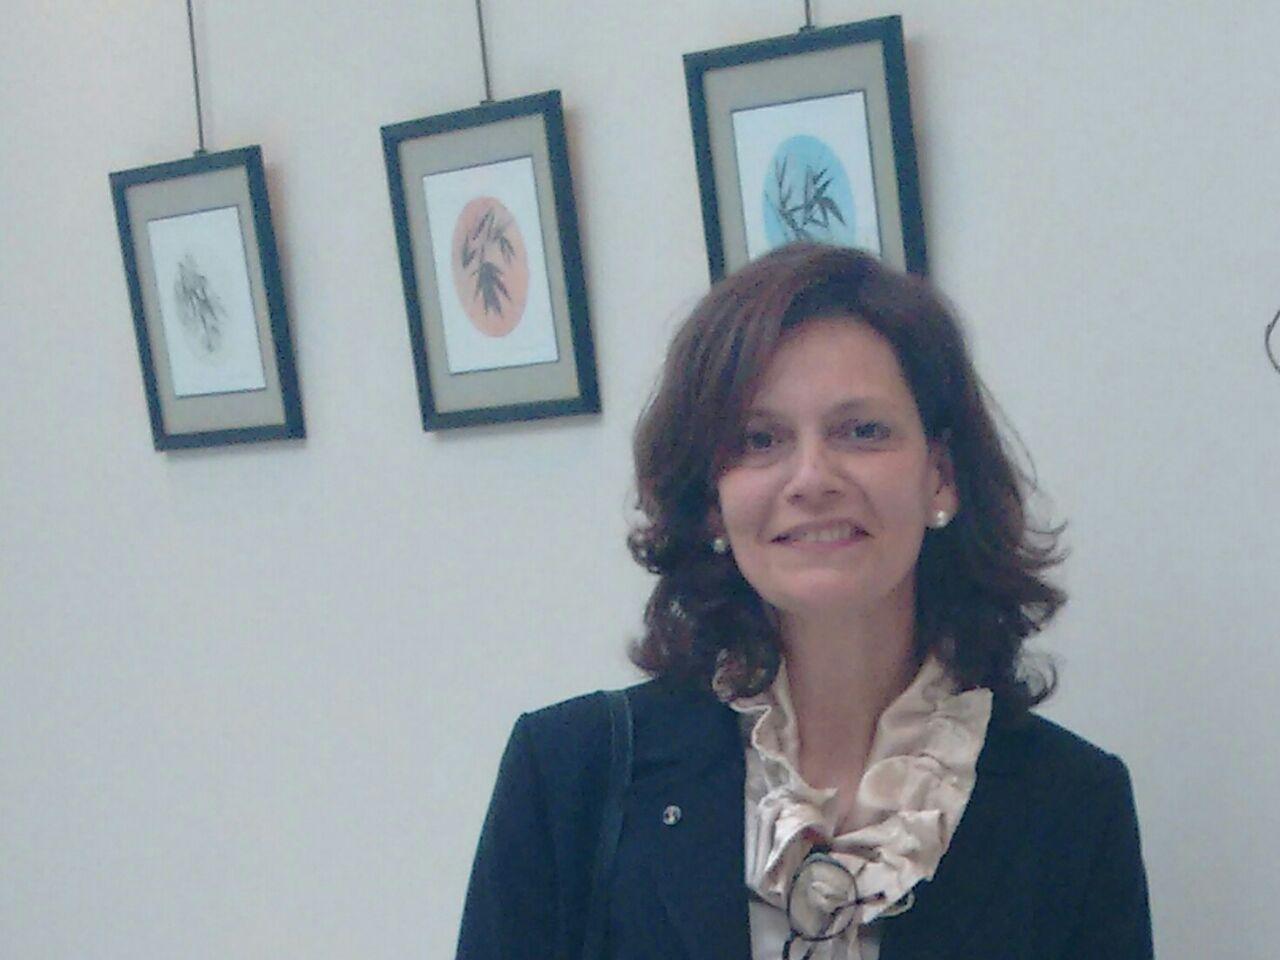 Ana L.R. Carrara